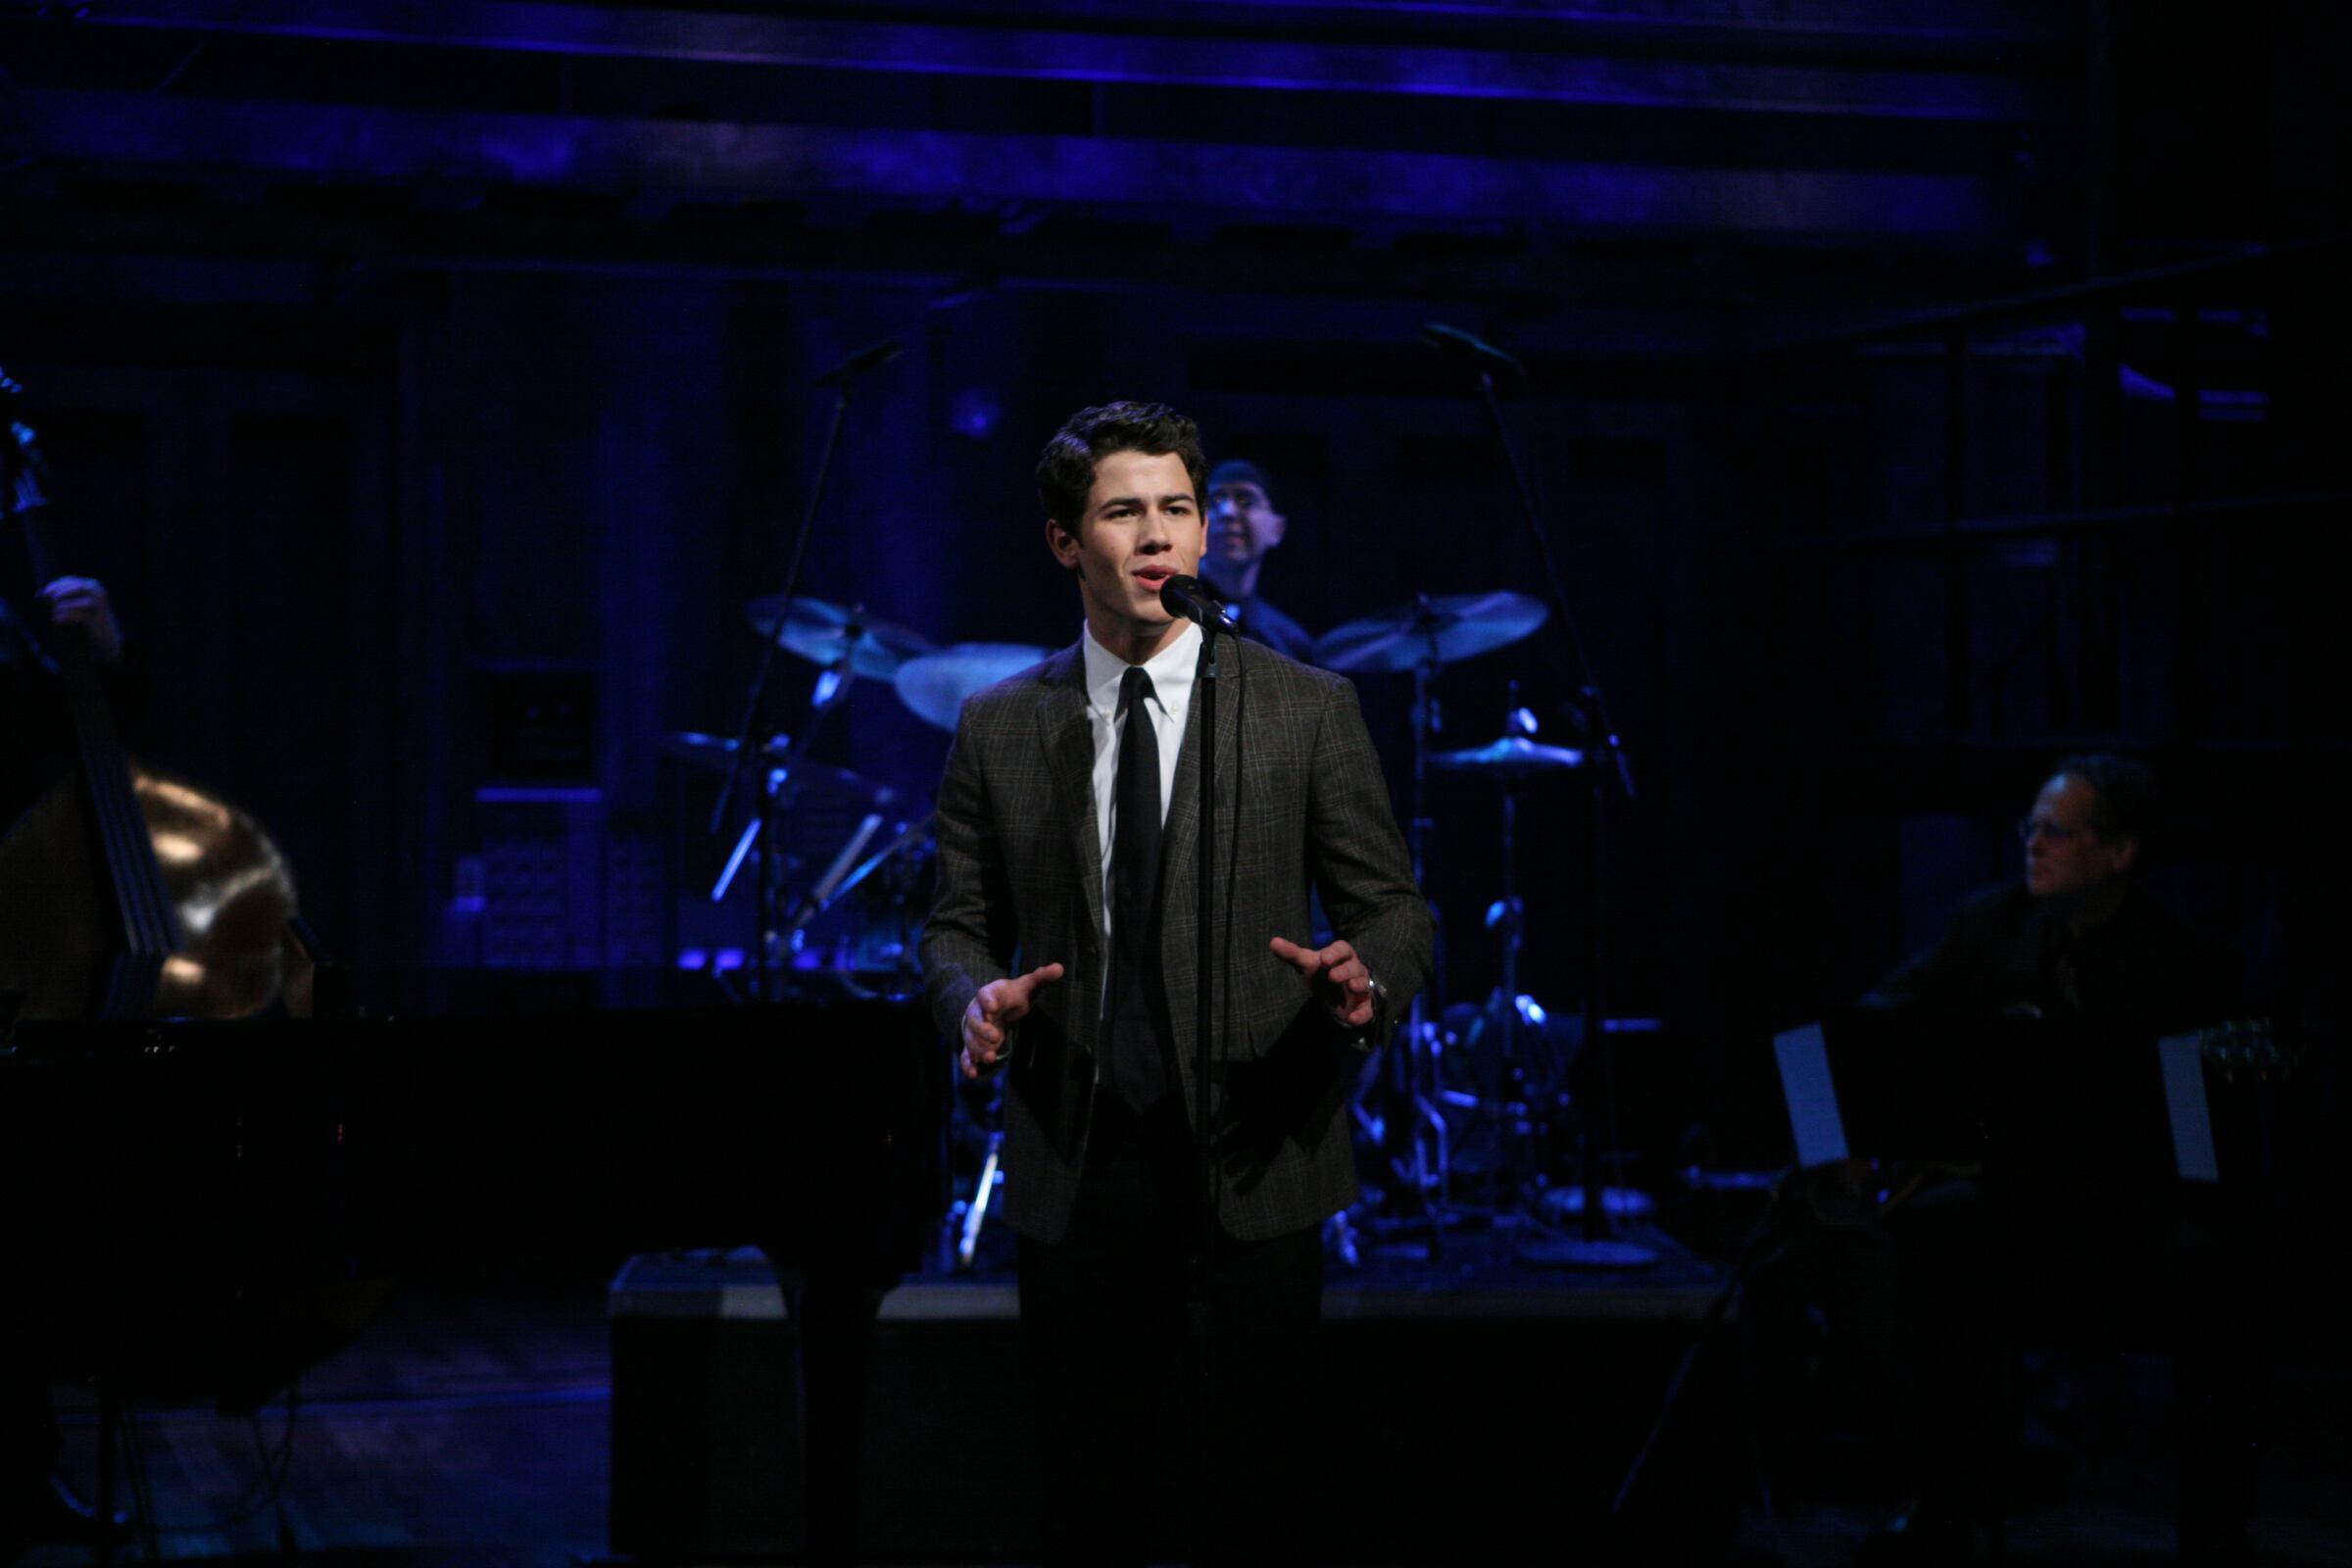 Late Night with Jimmy Fallon - Season 3